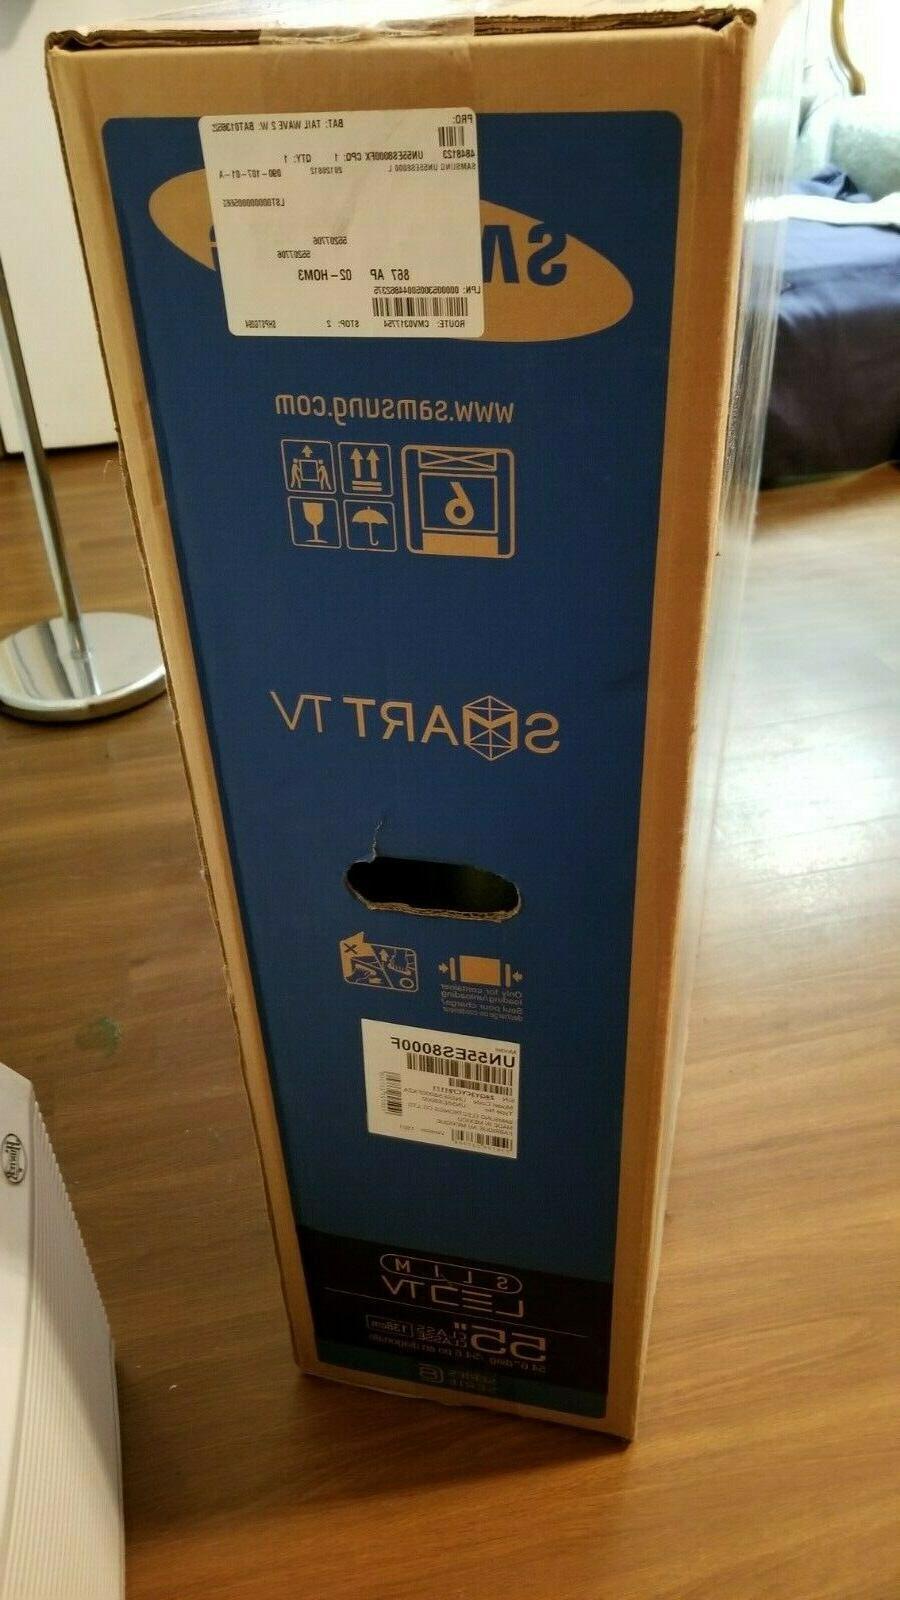 "Samsung 8000 Series 55"" Full 1080p HD Slim TV"